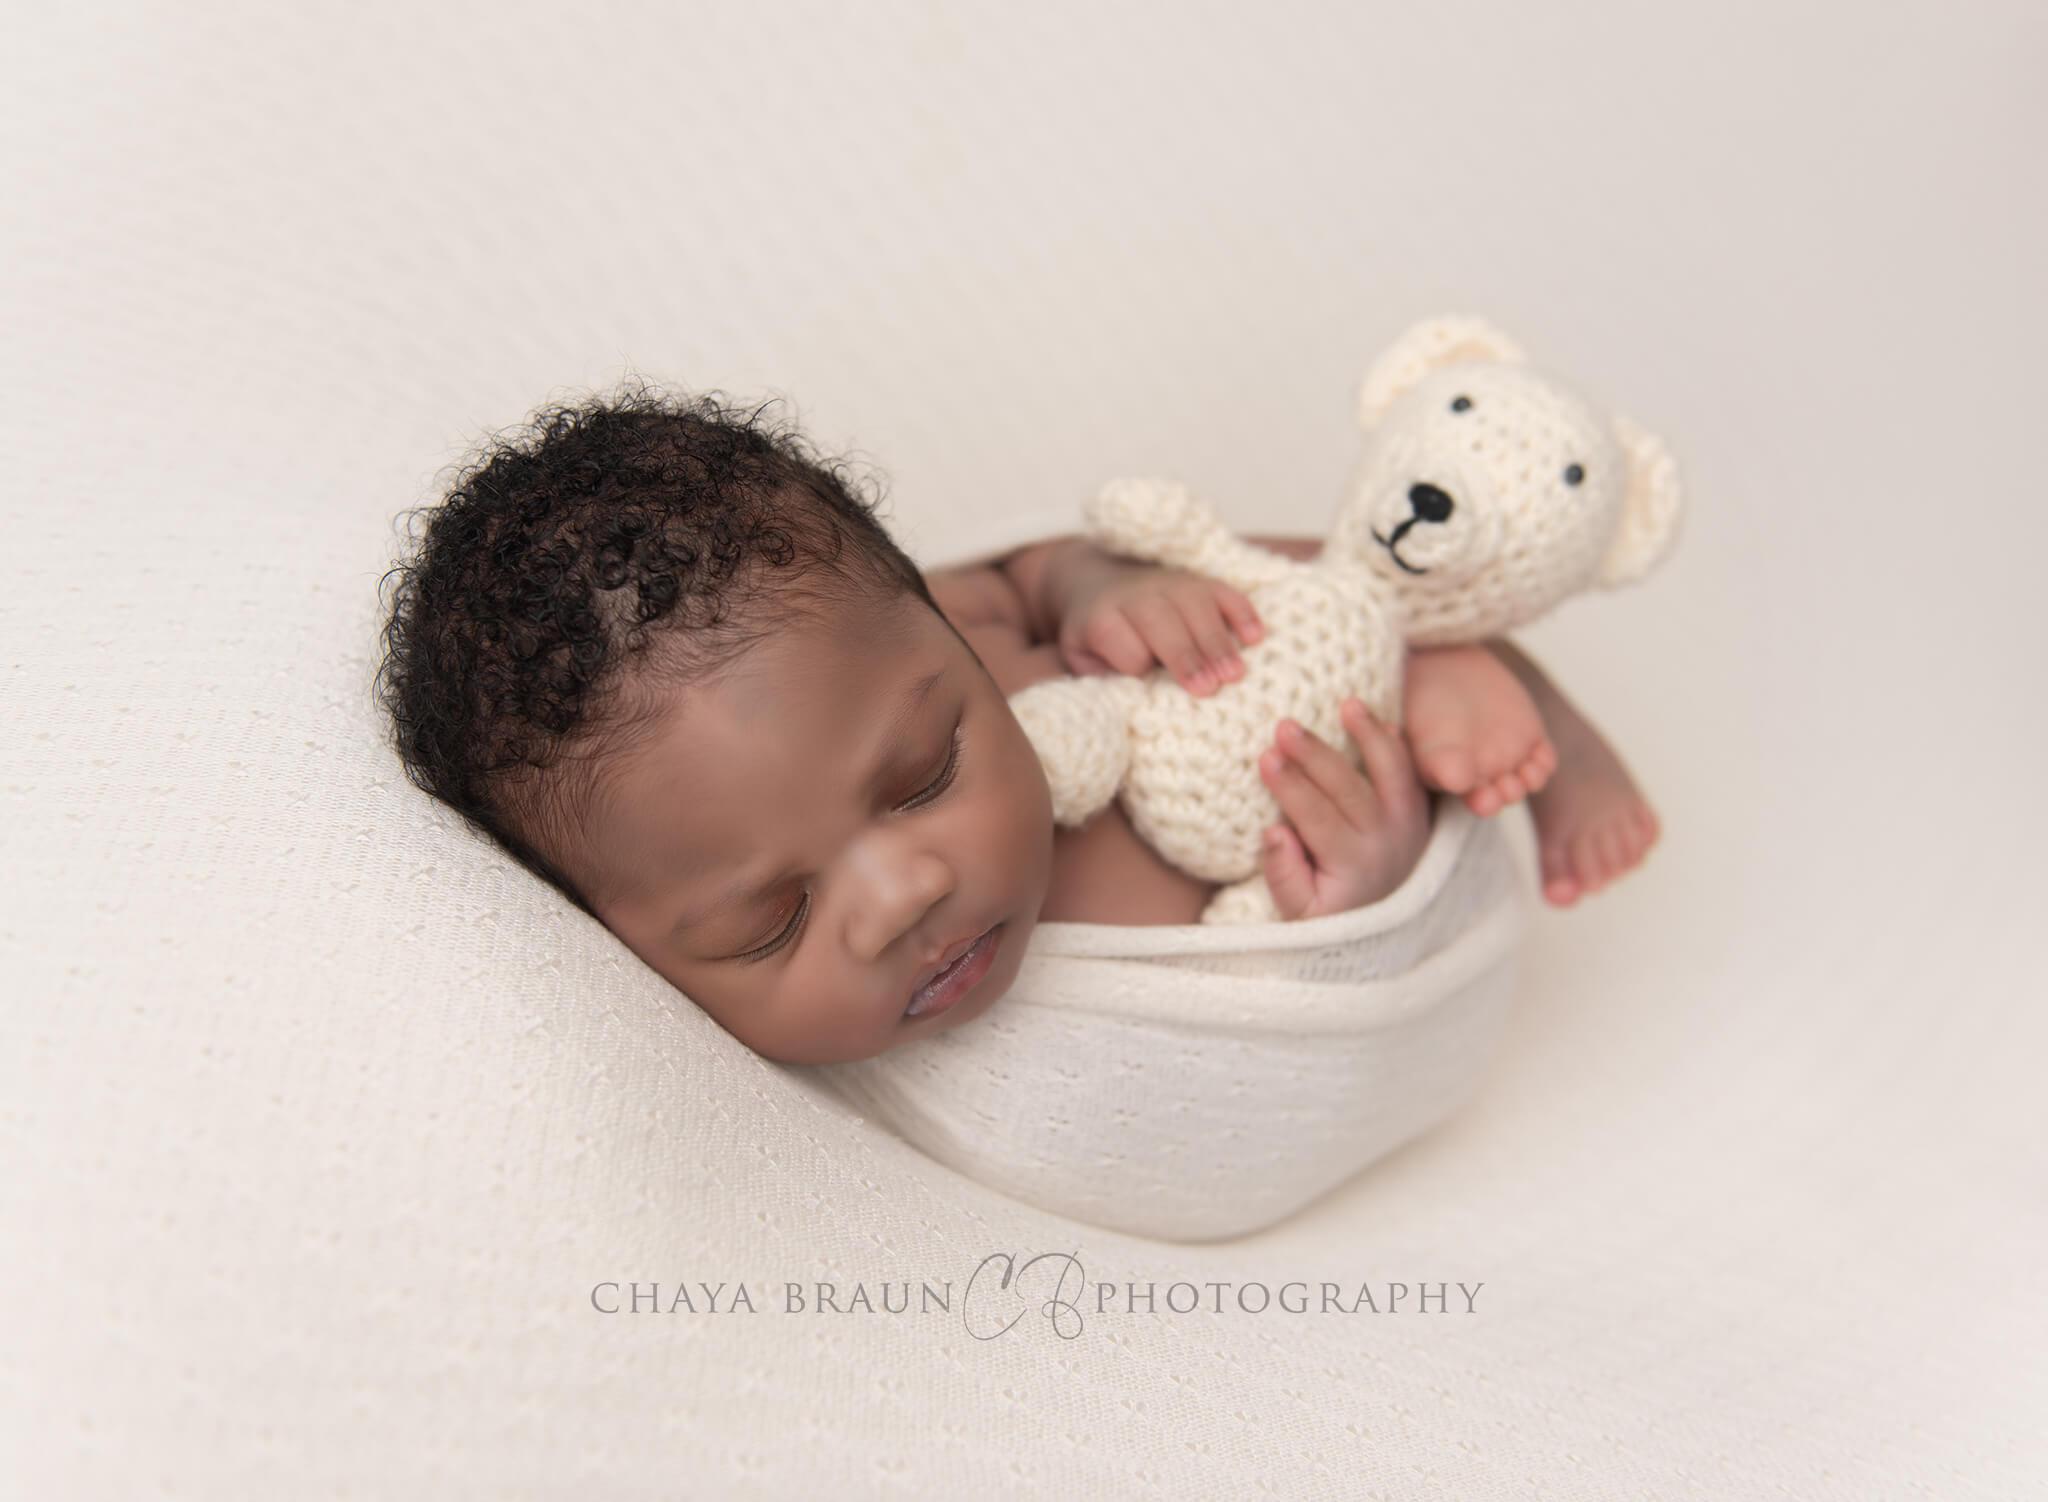 newborn baby and teddy bear